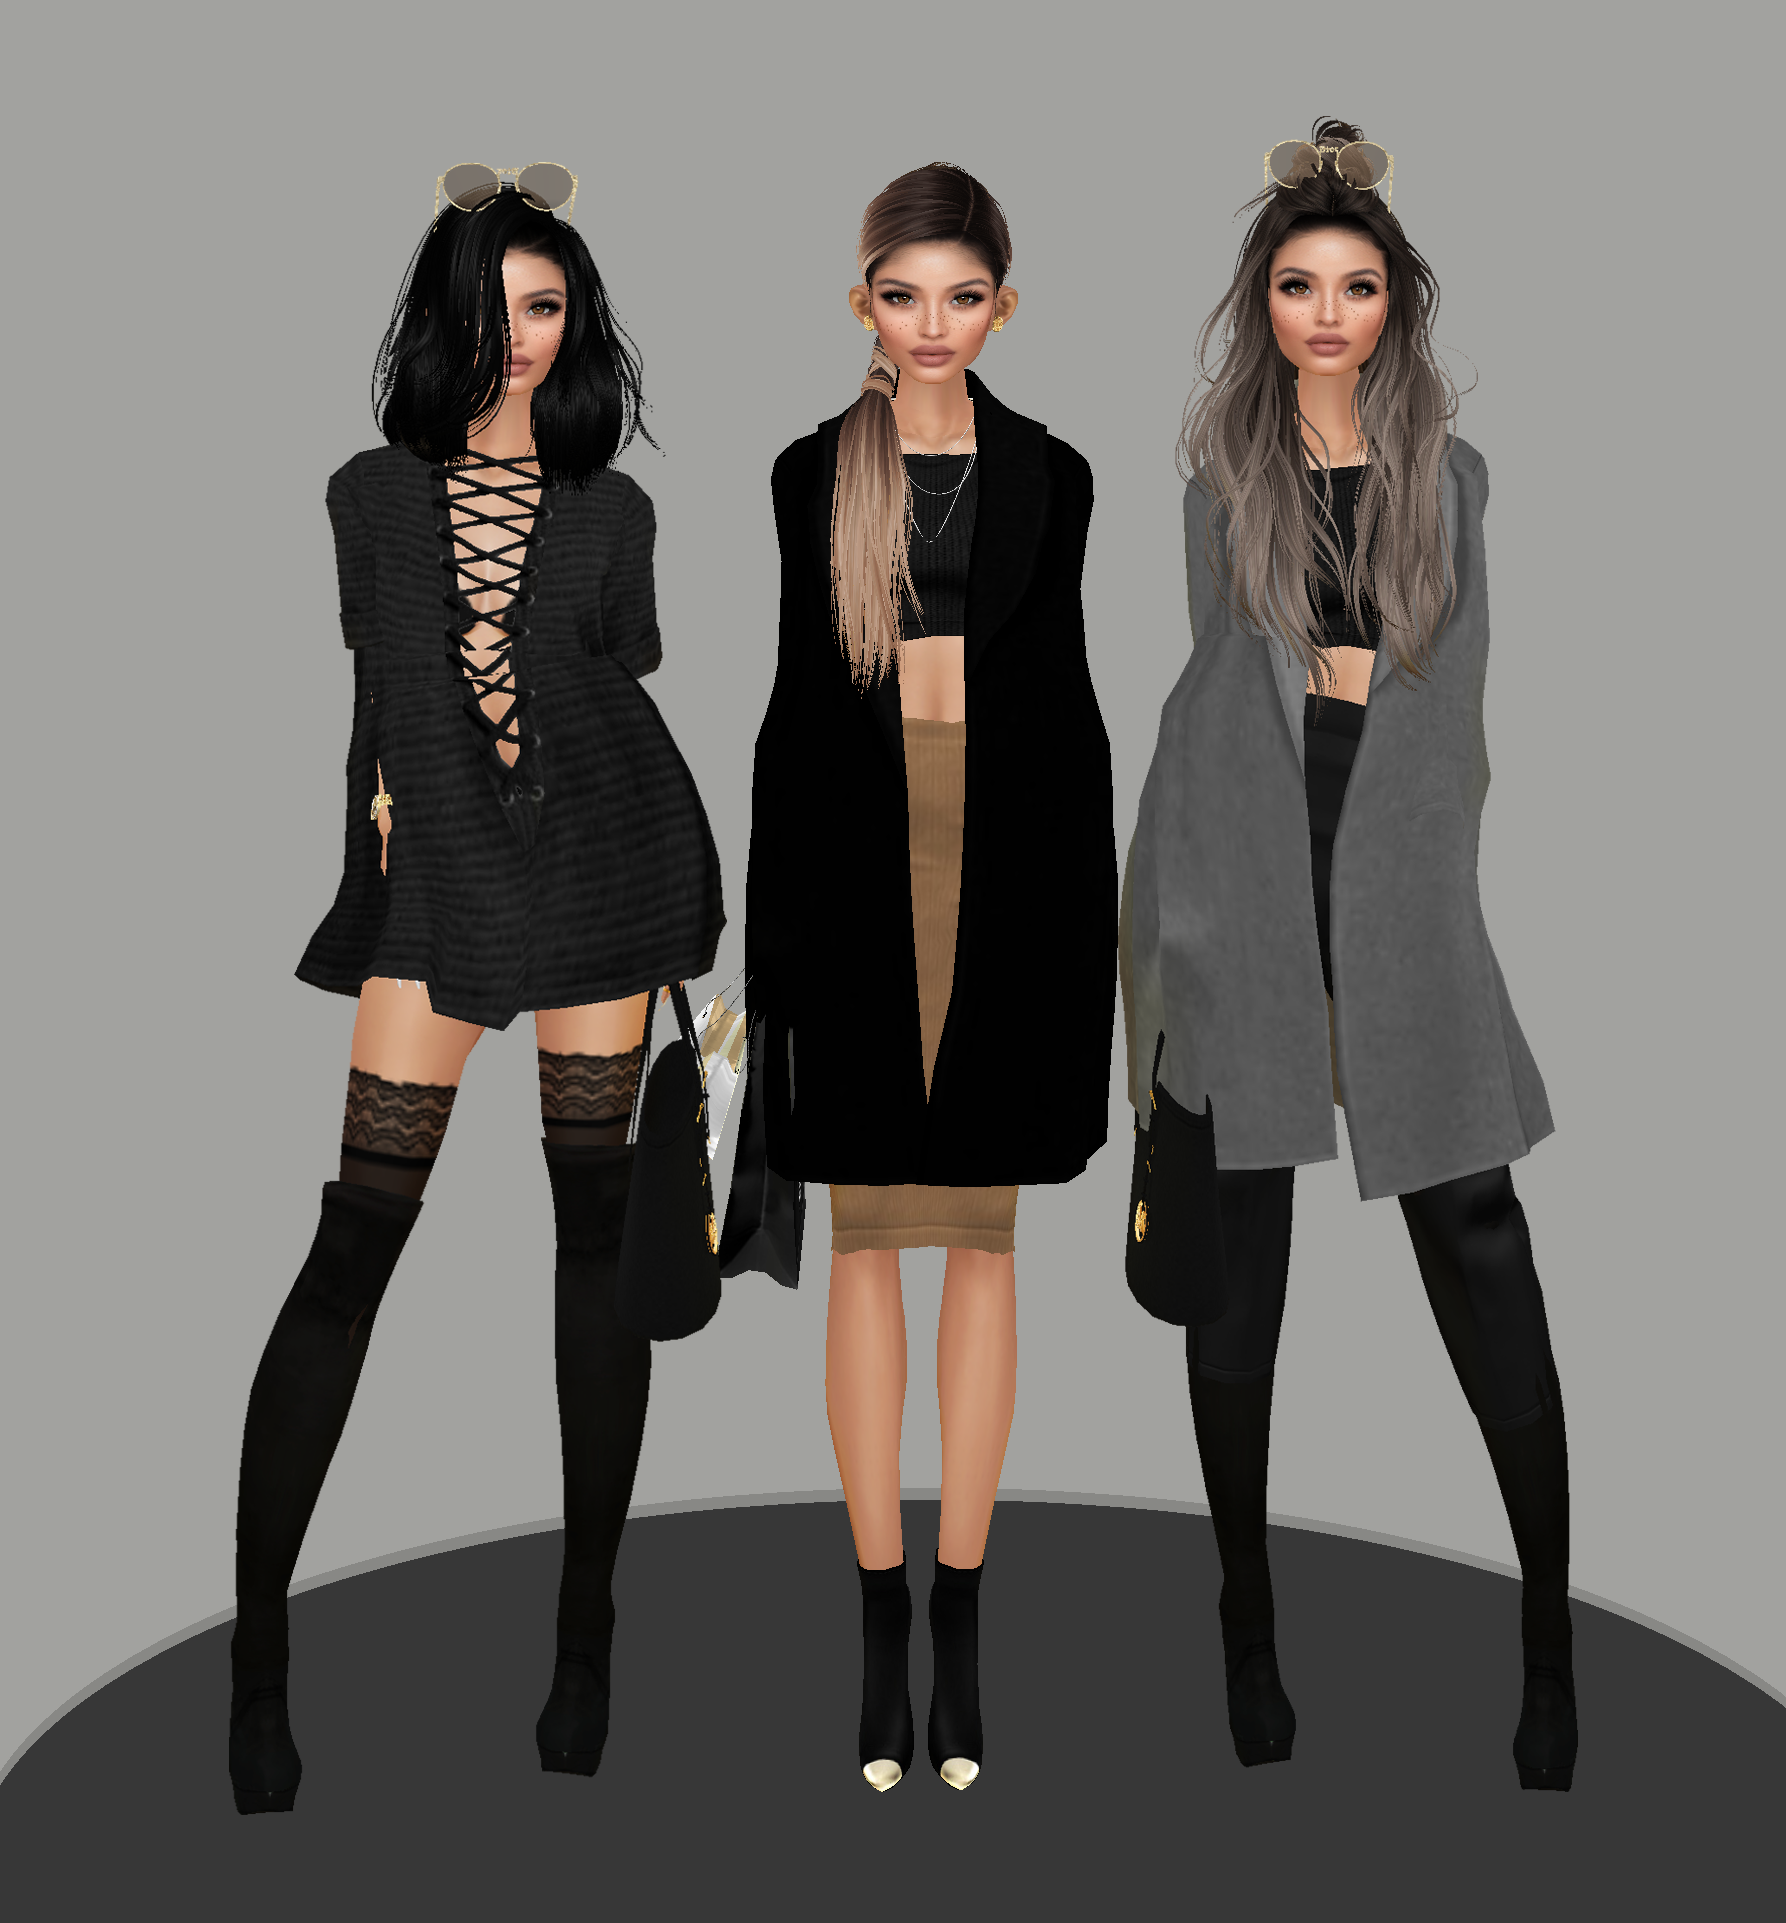 pinimvu on imvu high fashion  fashion illustration